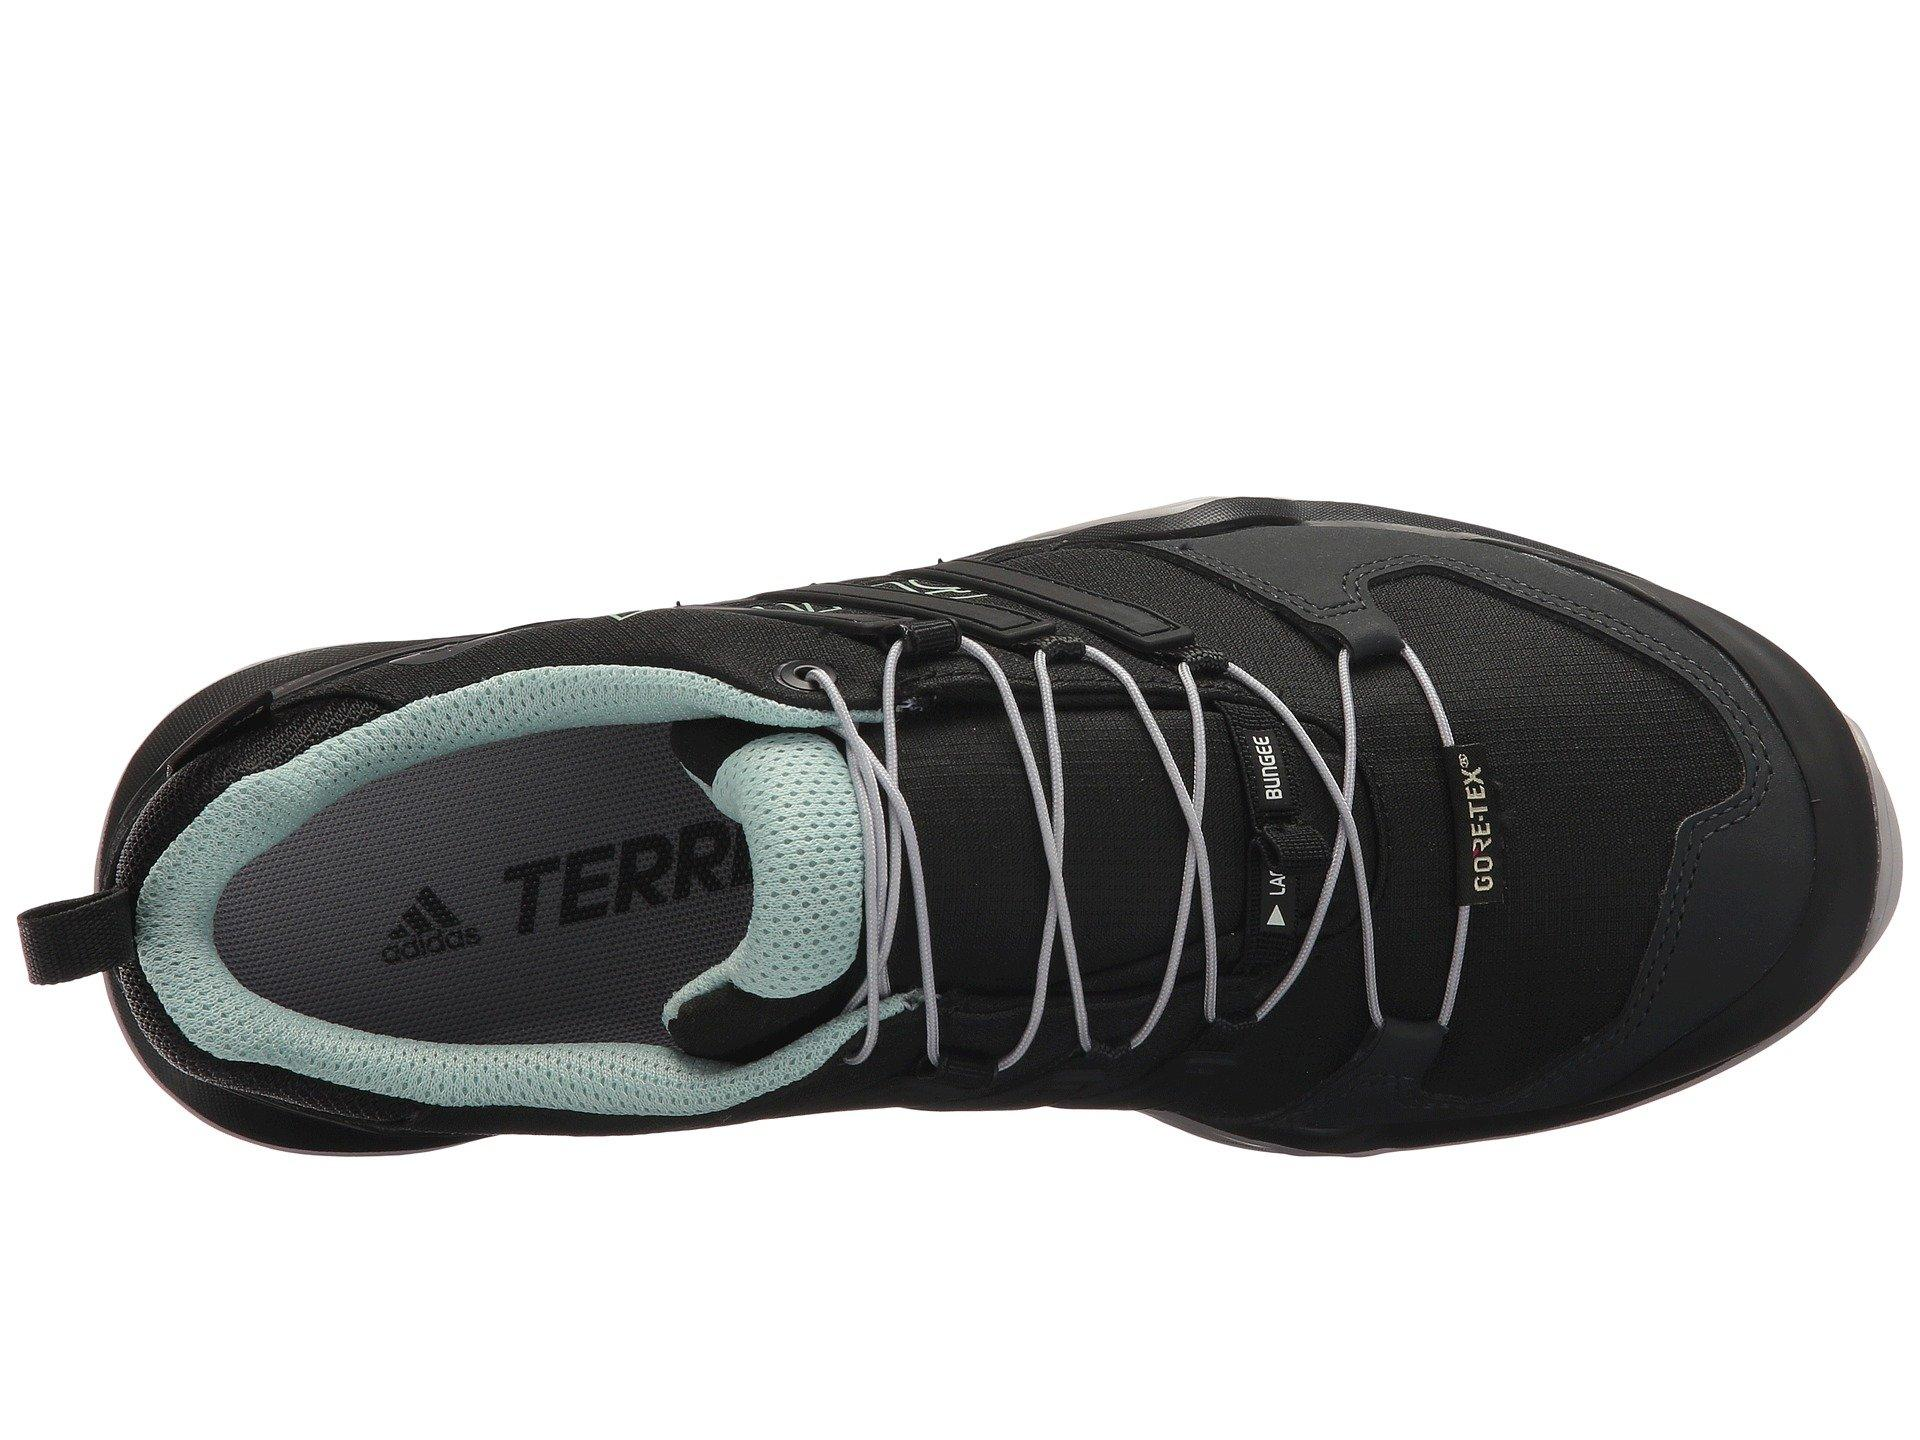 9257b073035ea Adidas Originals - Black Terrex Swift R2 Gtx(r) (ash Grey grey. View  fullscreen